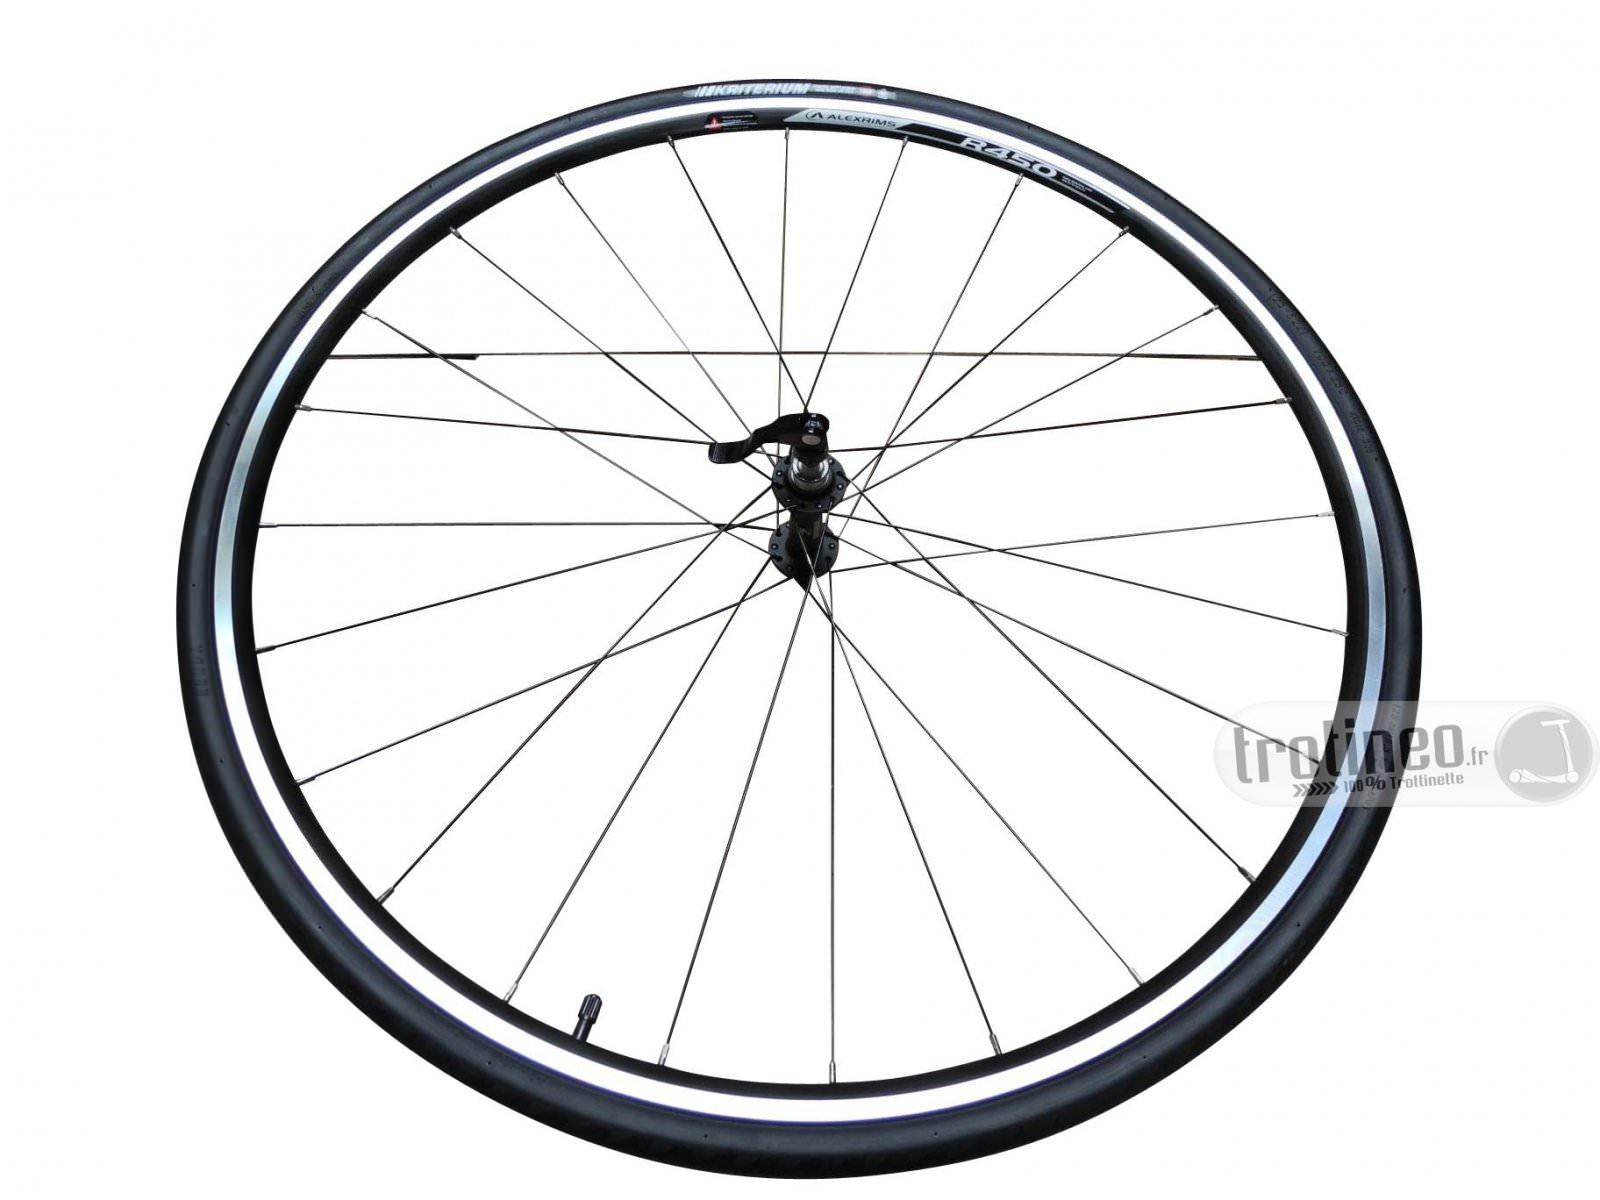 kickbike-roue complète Av RaceMax 700